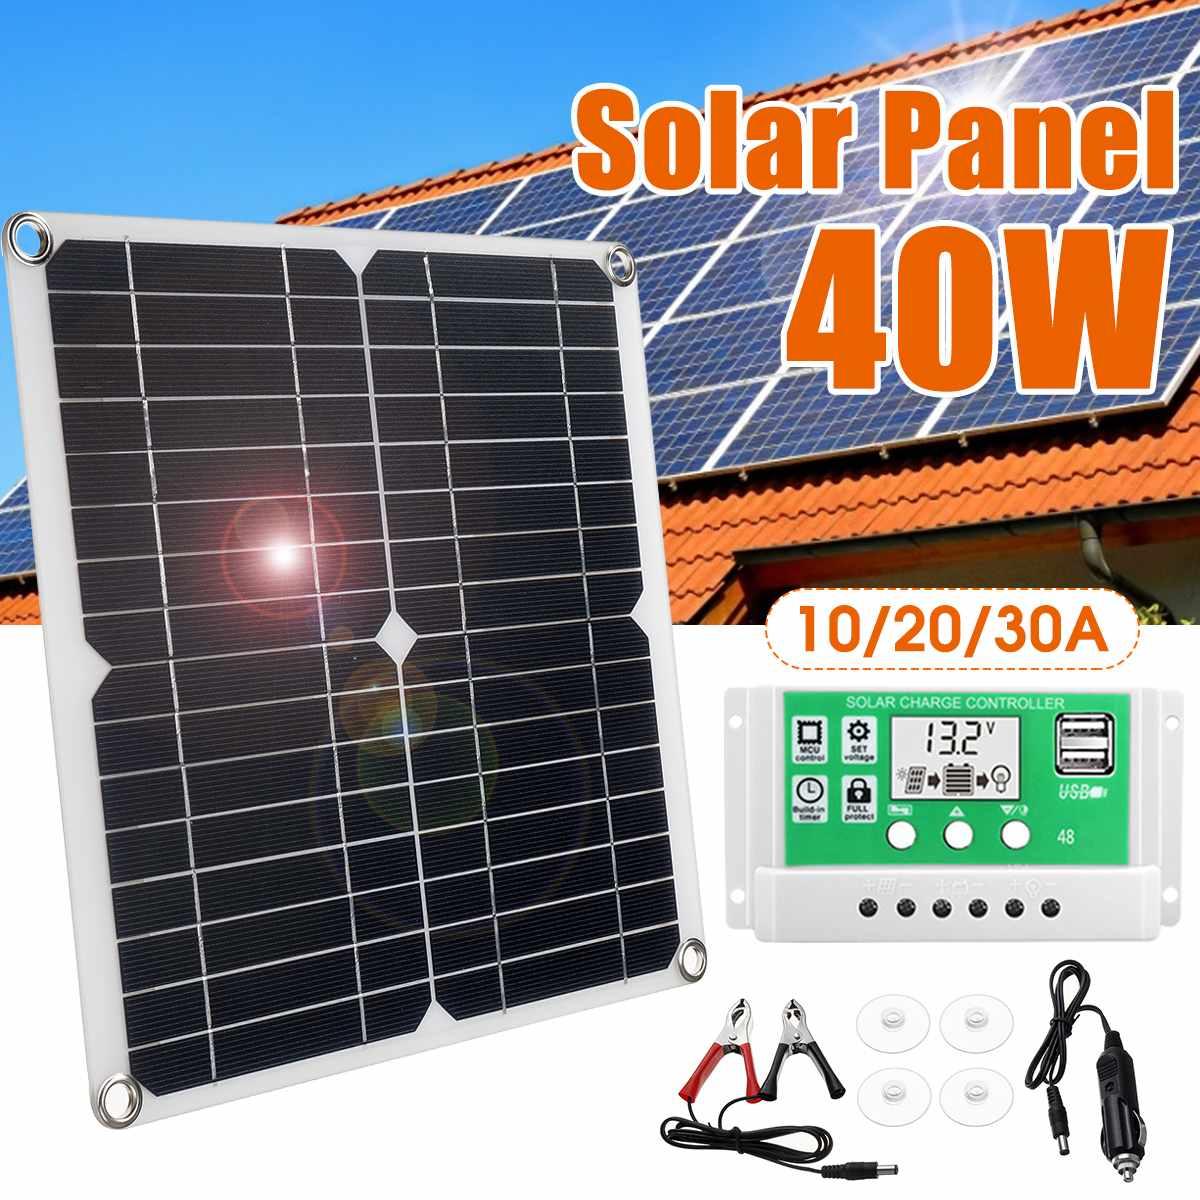 portatil 40 w painel solar monocrystalline silicio banco de energia solar 10 20 30a controlador sistema